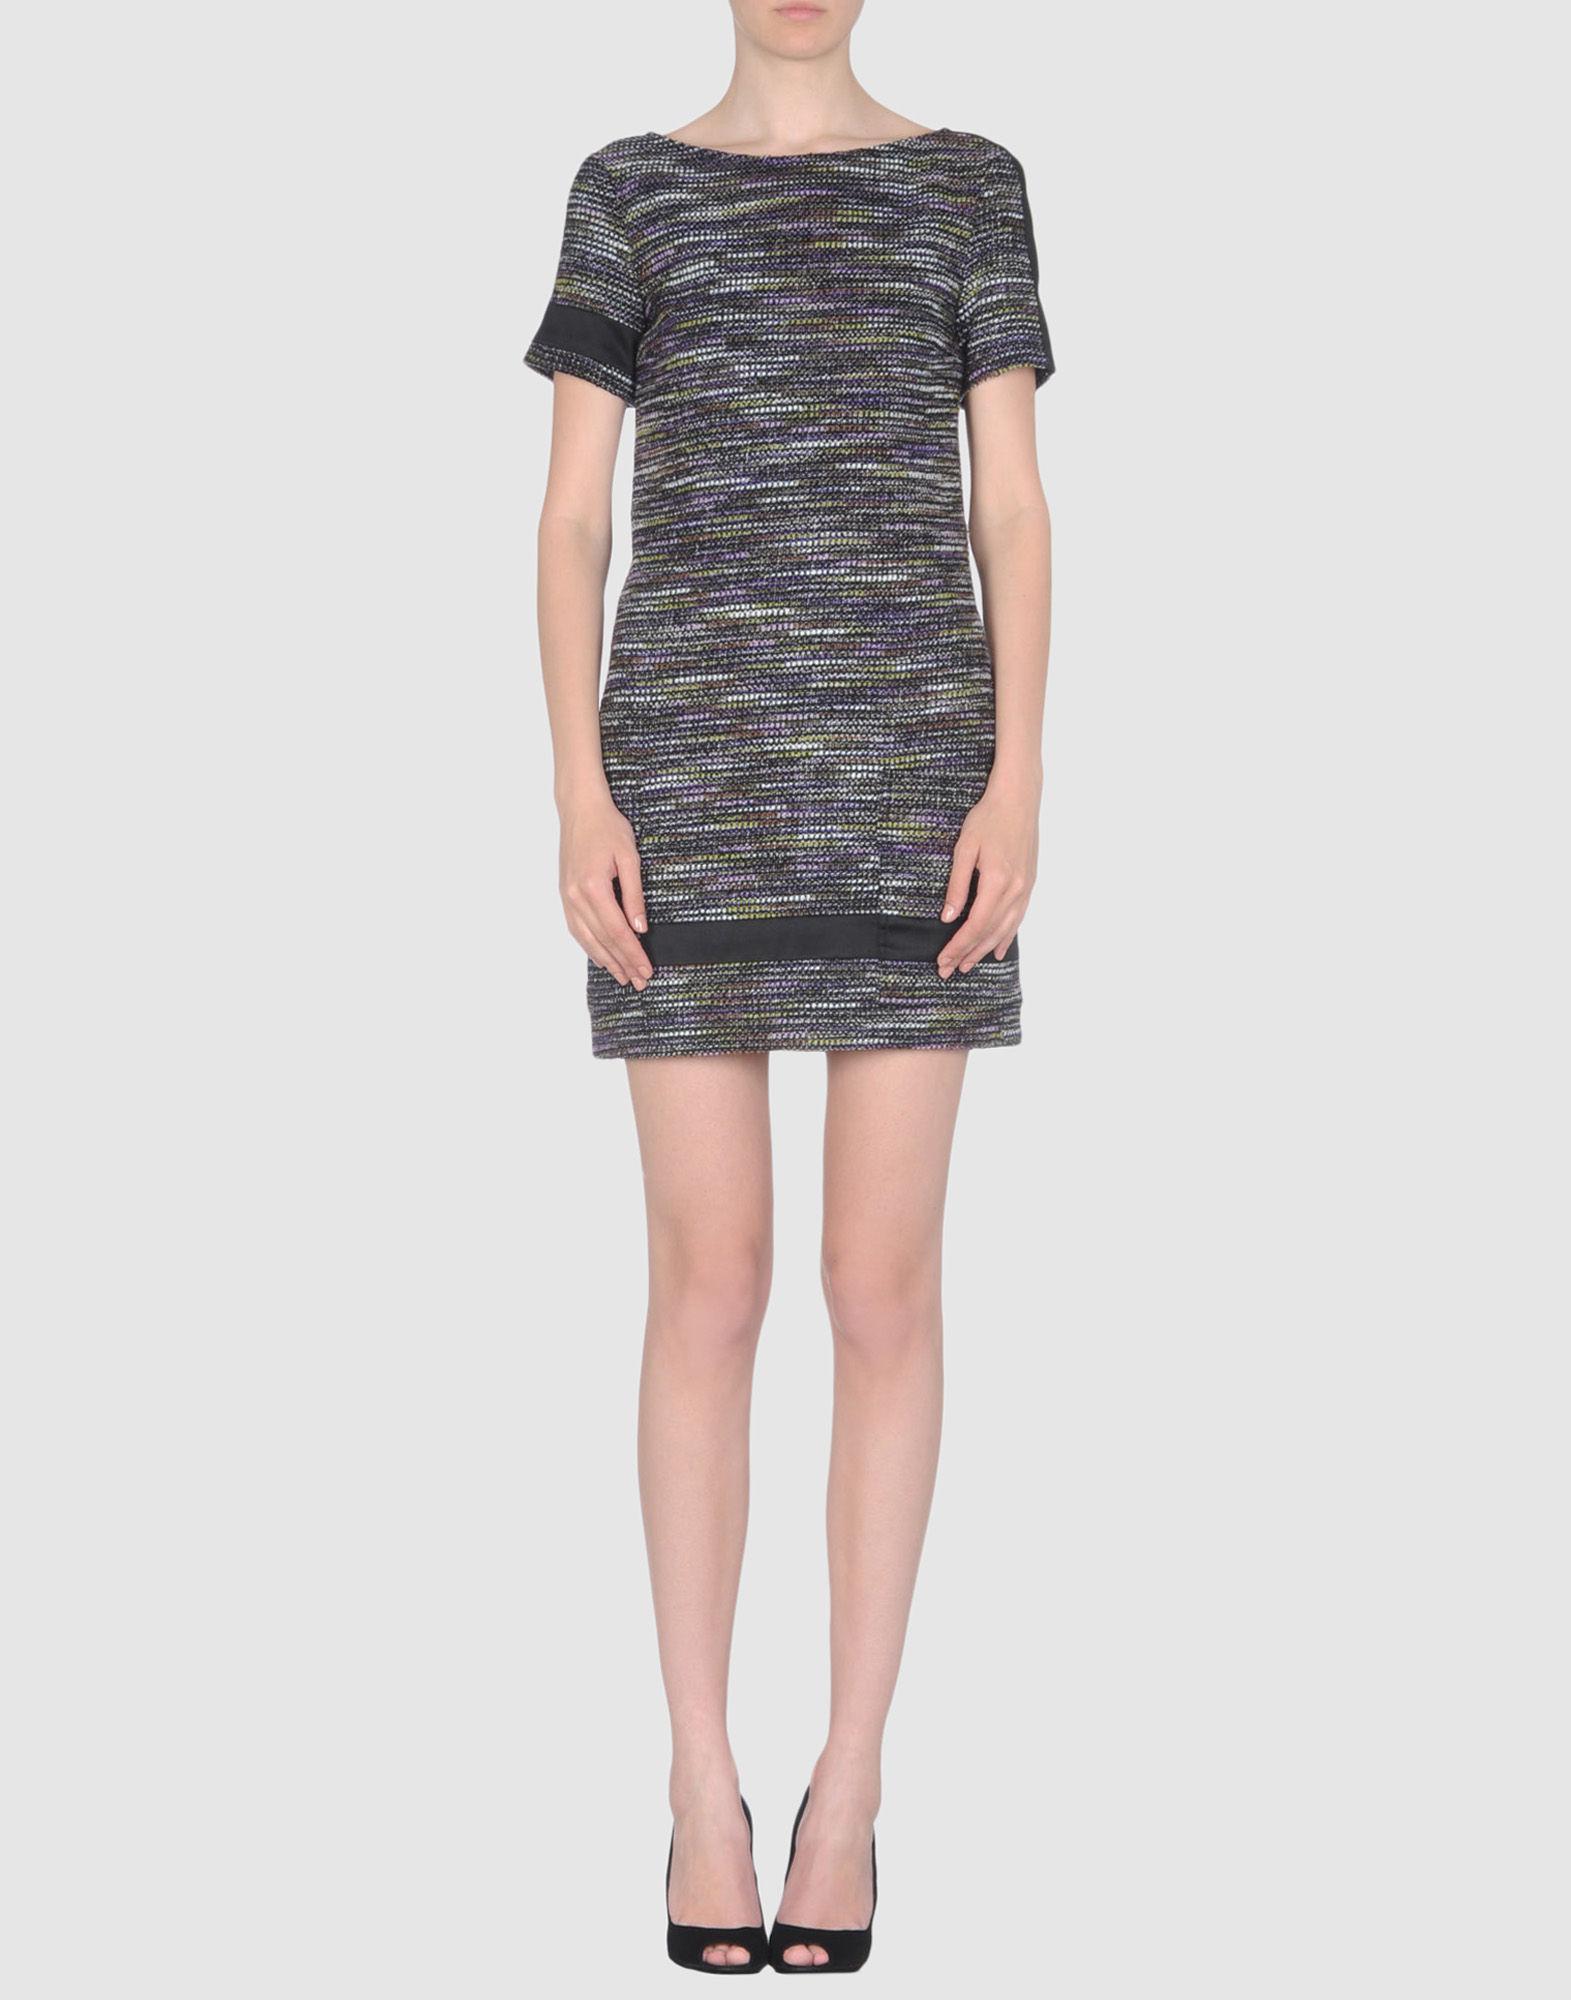 34212914VX 14 f - Casual Φορεματα Versace 2011 2012 Κωδ.02